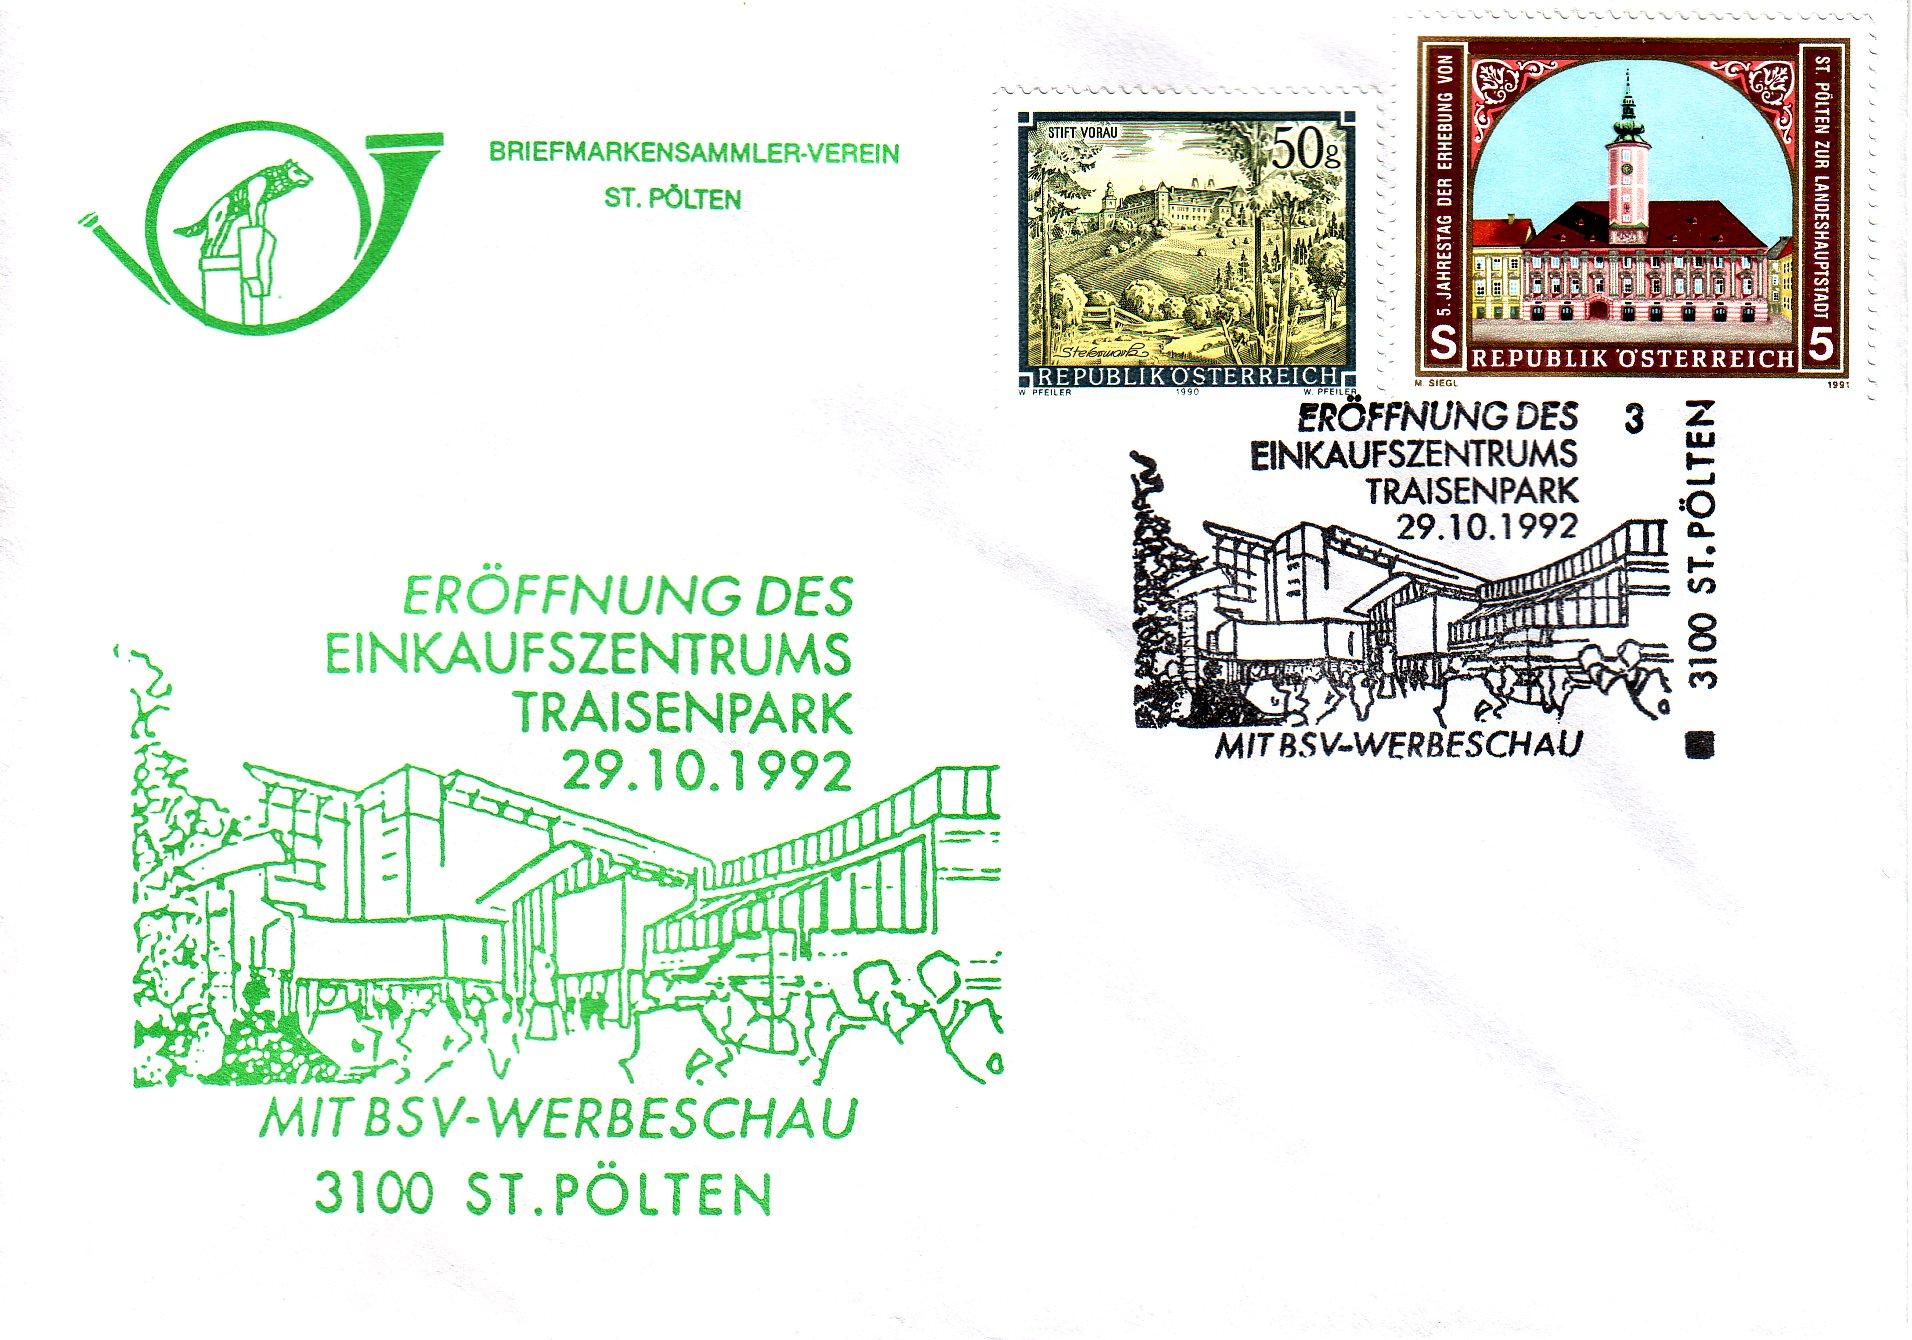 1992 1.-EUR EKZ Traisenpark 29.10